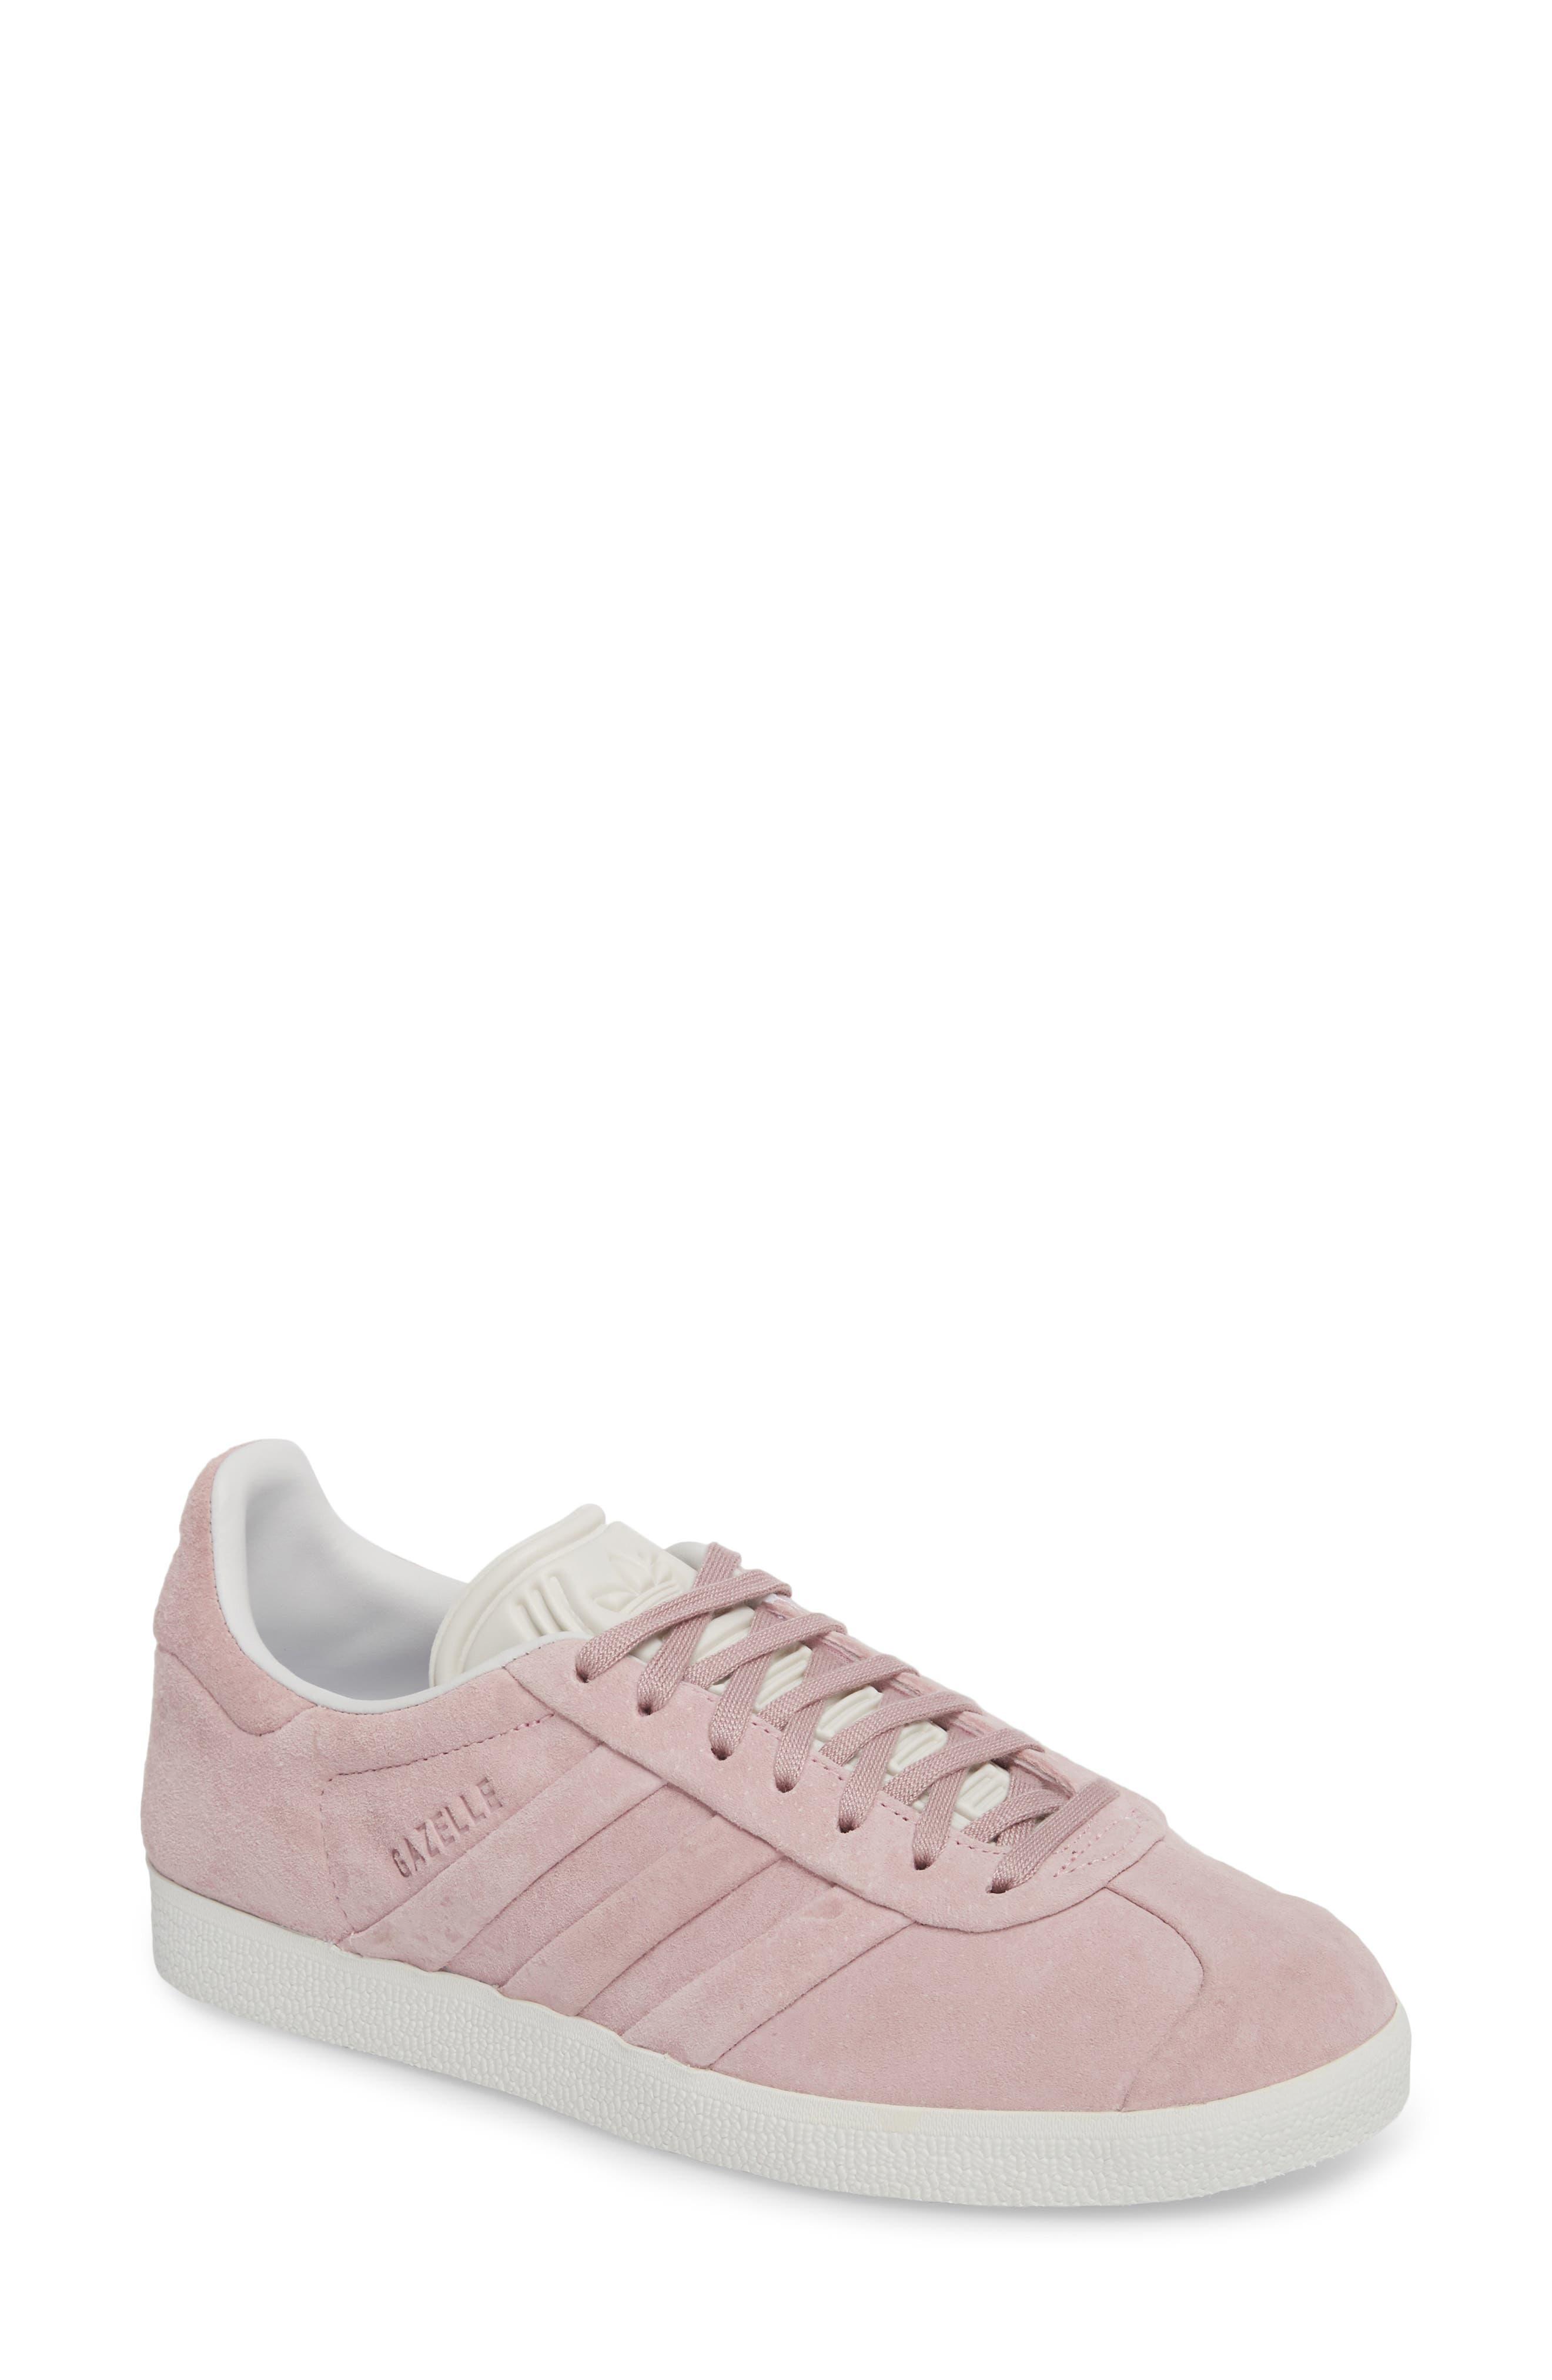 adidas Gazelle Stitch & Turn Sneaker